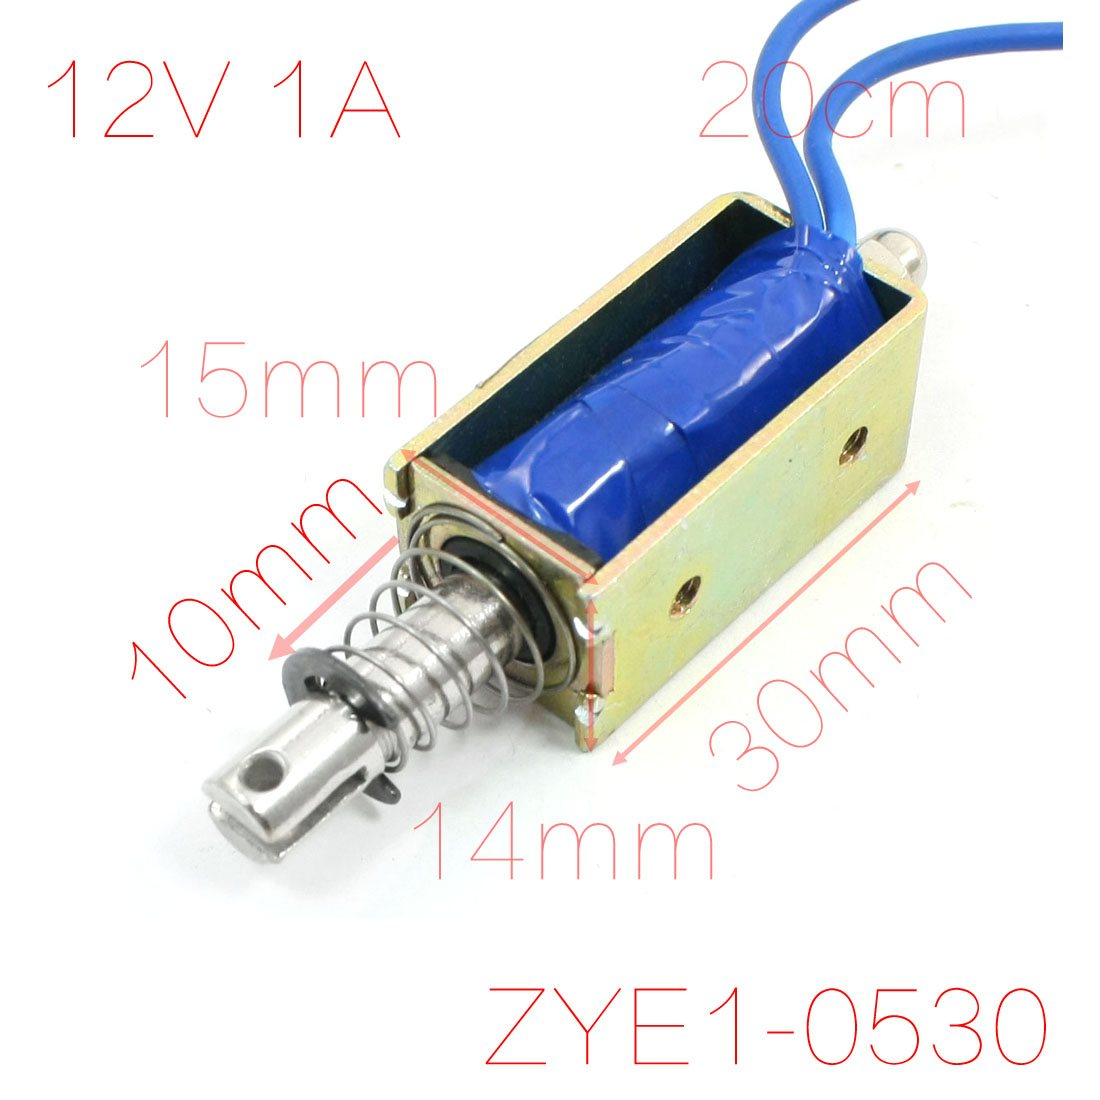 High Quality DC 12V 1A 10mm Stroke 600g Push Pull Type Open Frame DC Solenoid Electromagnet dc 12v 2a 0 7kg holding force 10mm stroke solenoid electromagnet